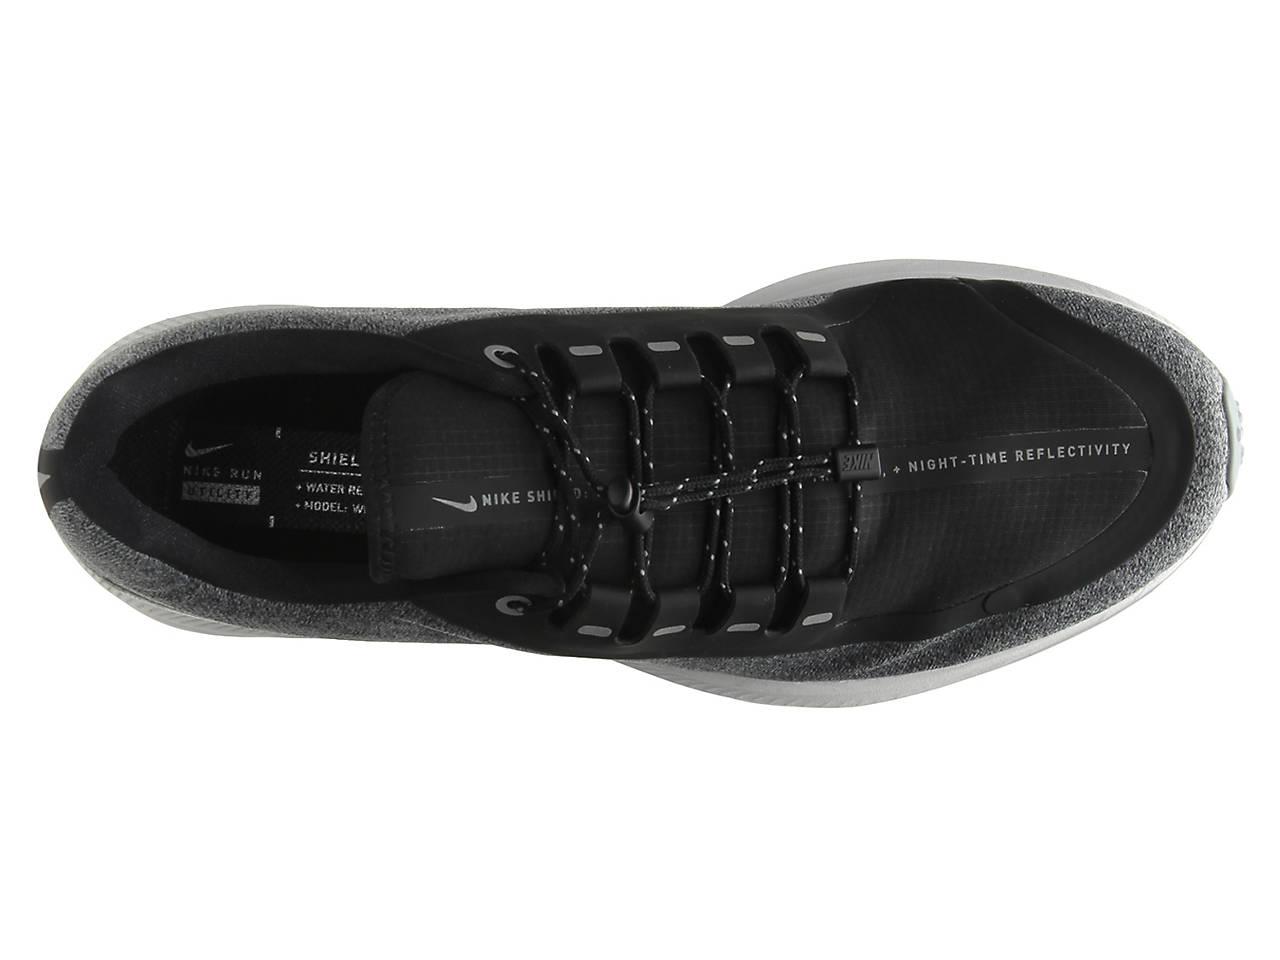 97a934a842fc Nike Zoom Winflo 5 Shield Lightweight Running Shoe - Men s Men s ...